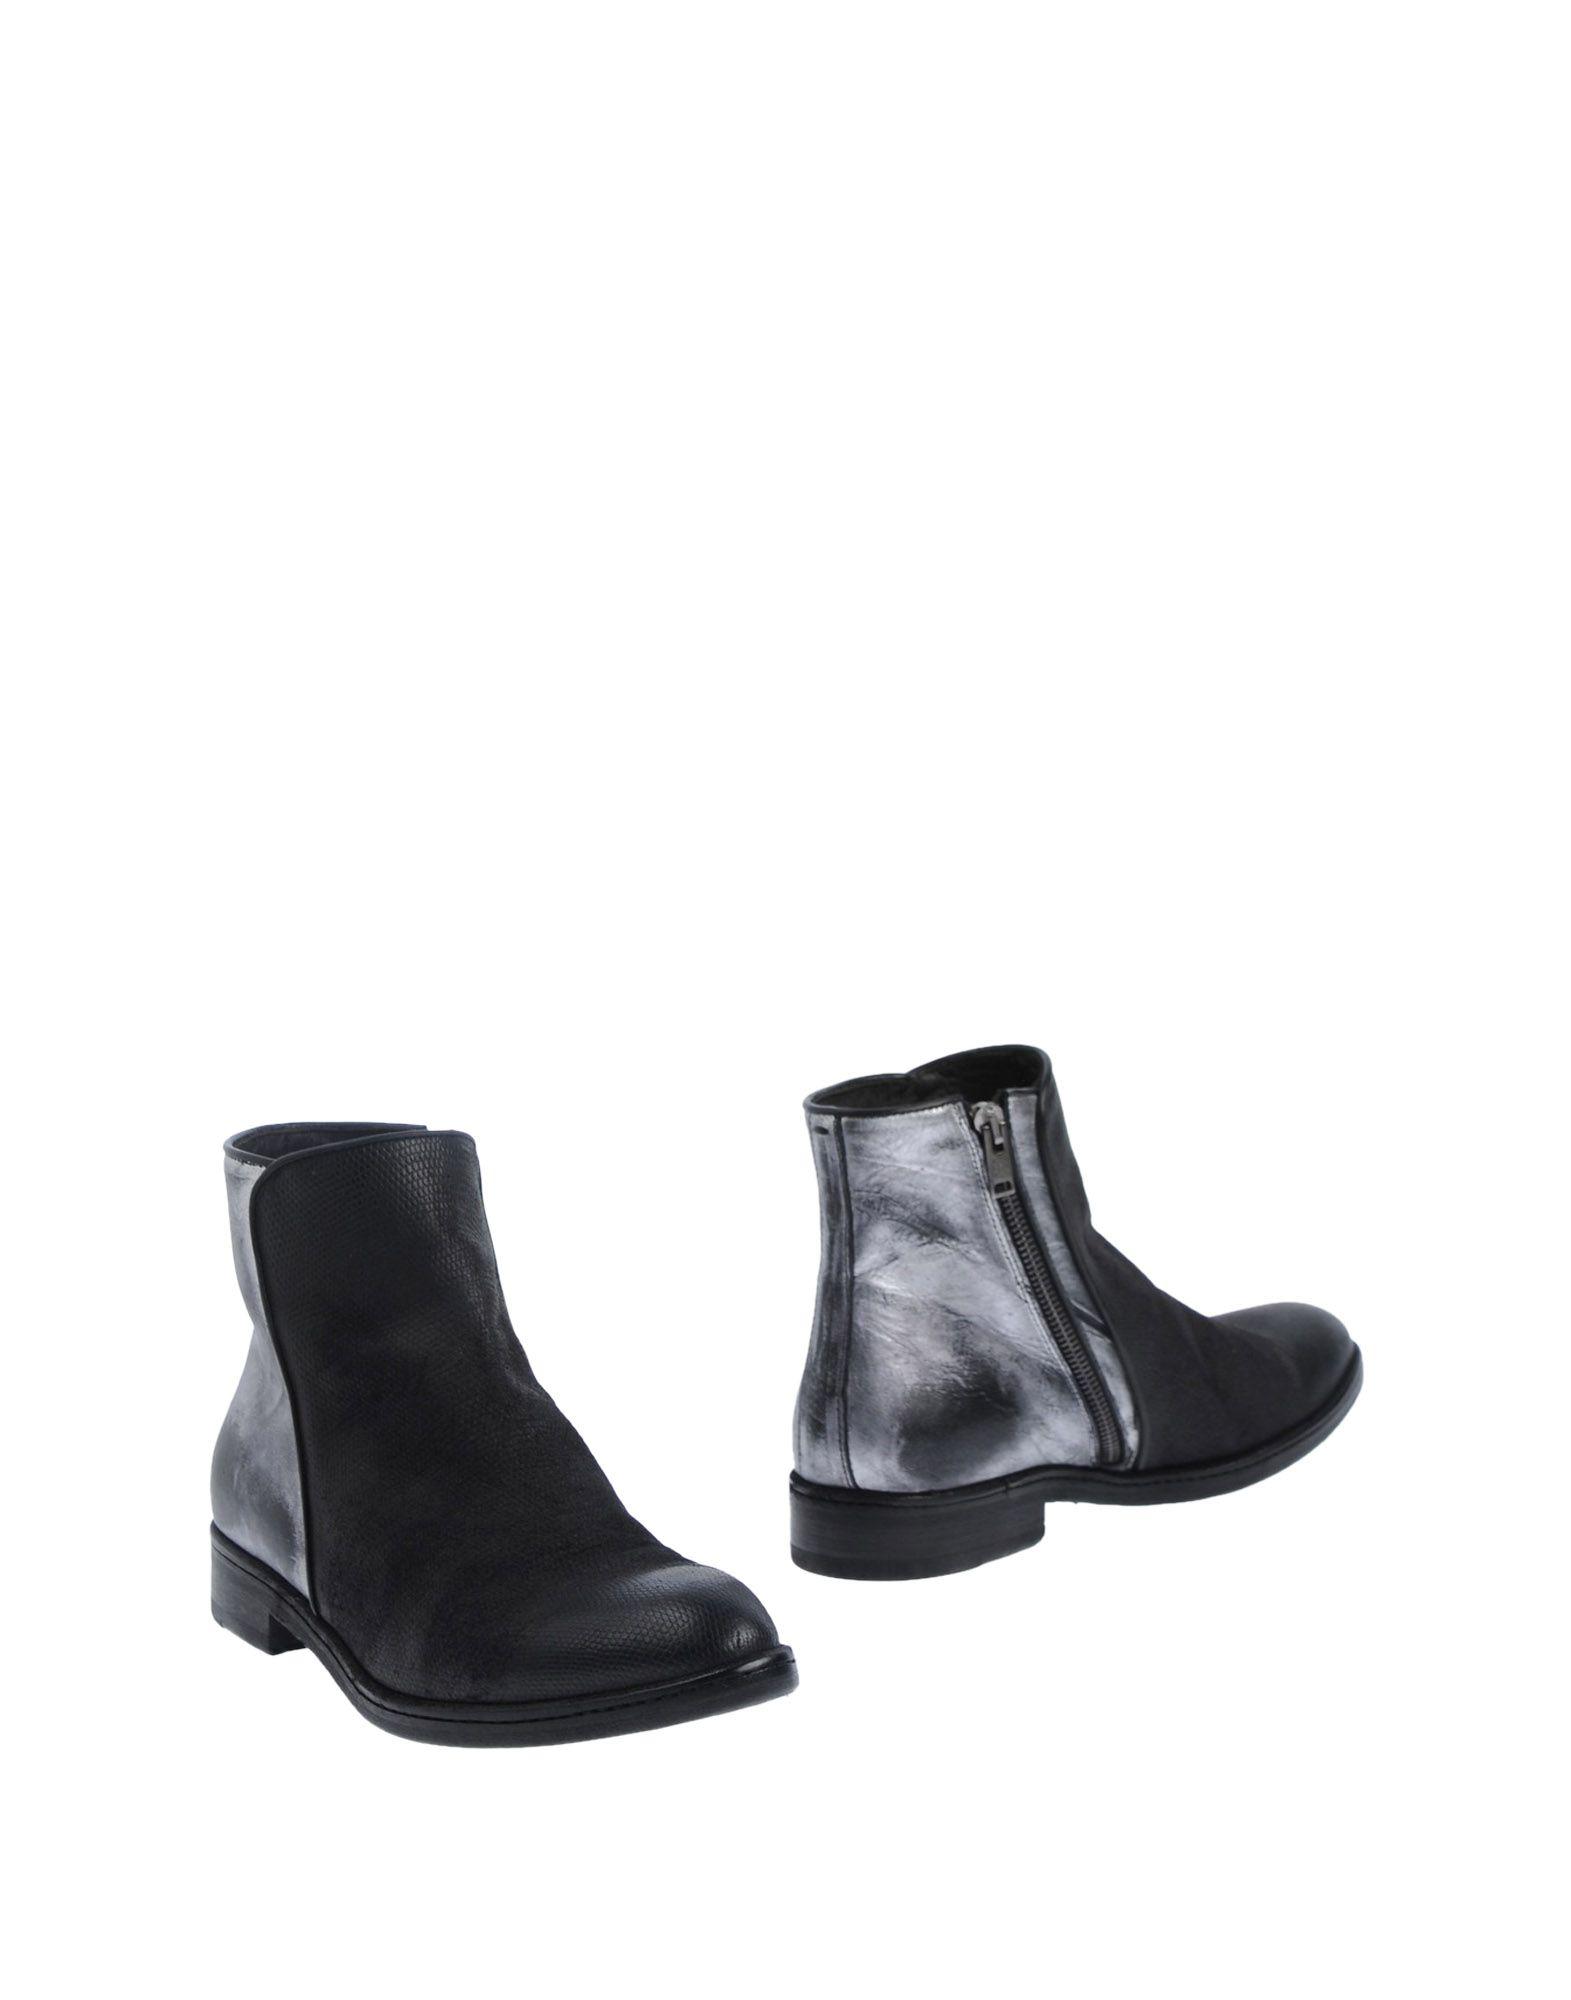 Pantanetti Stiefelette Damen  11507765VUGut aussehende strapazierfähige Schuhe